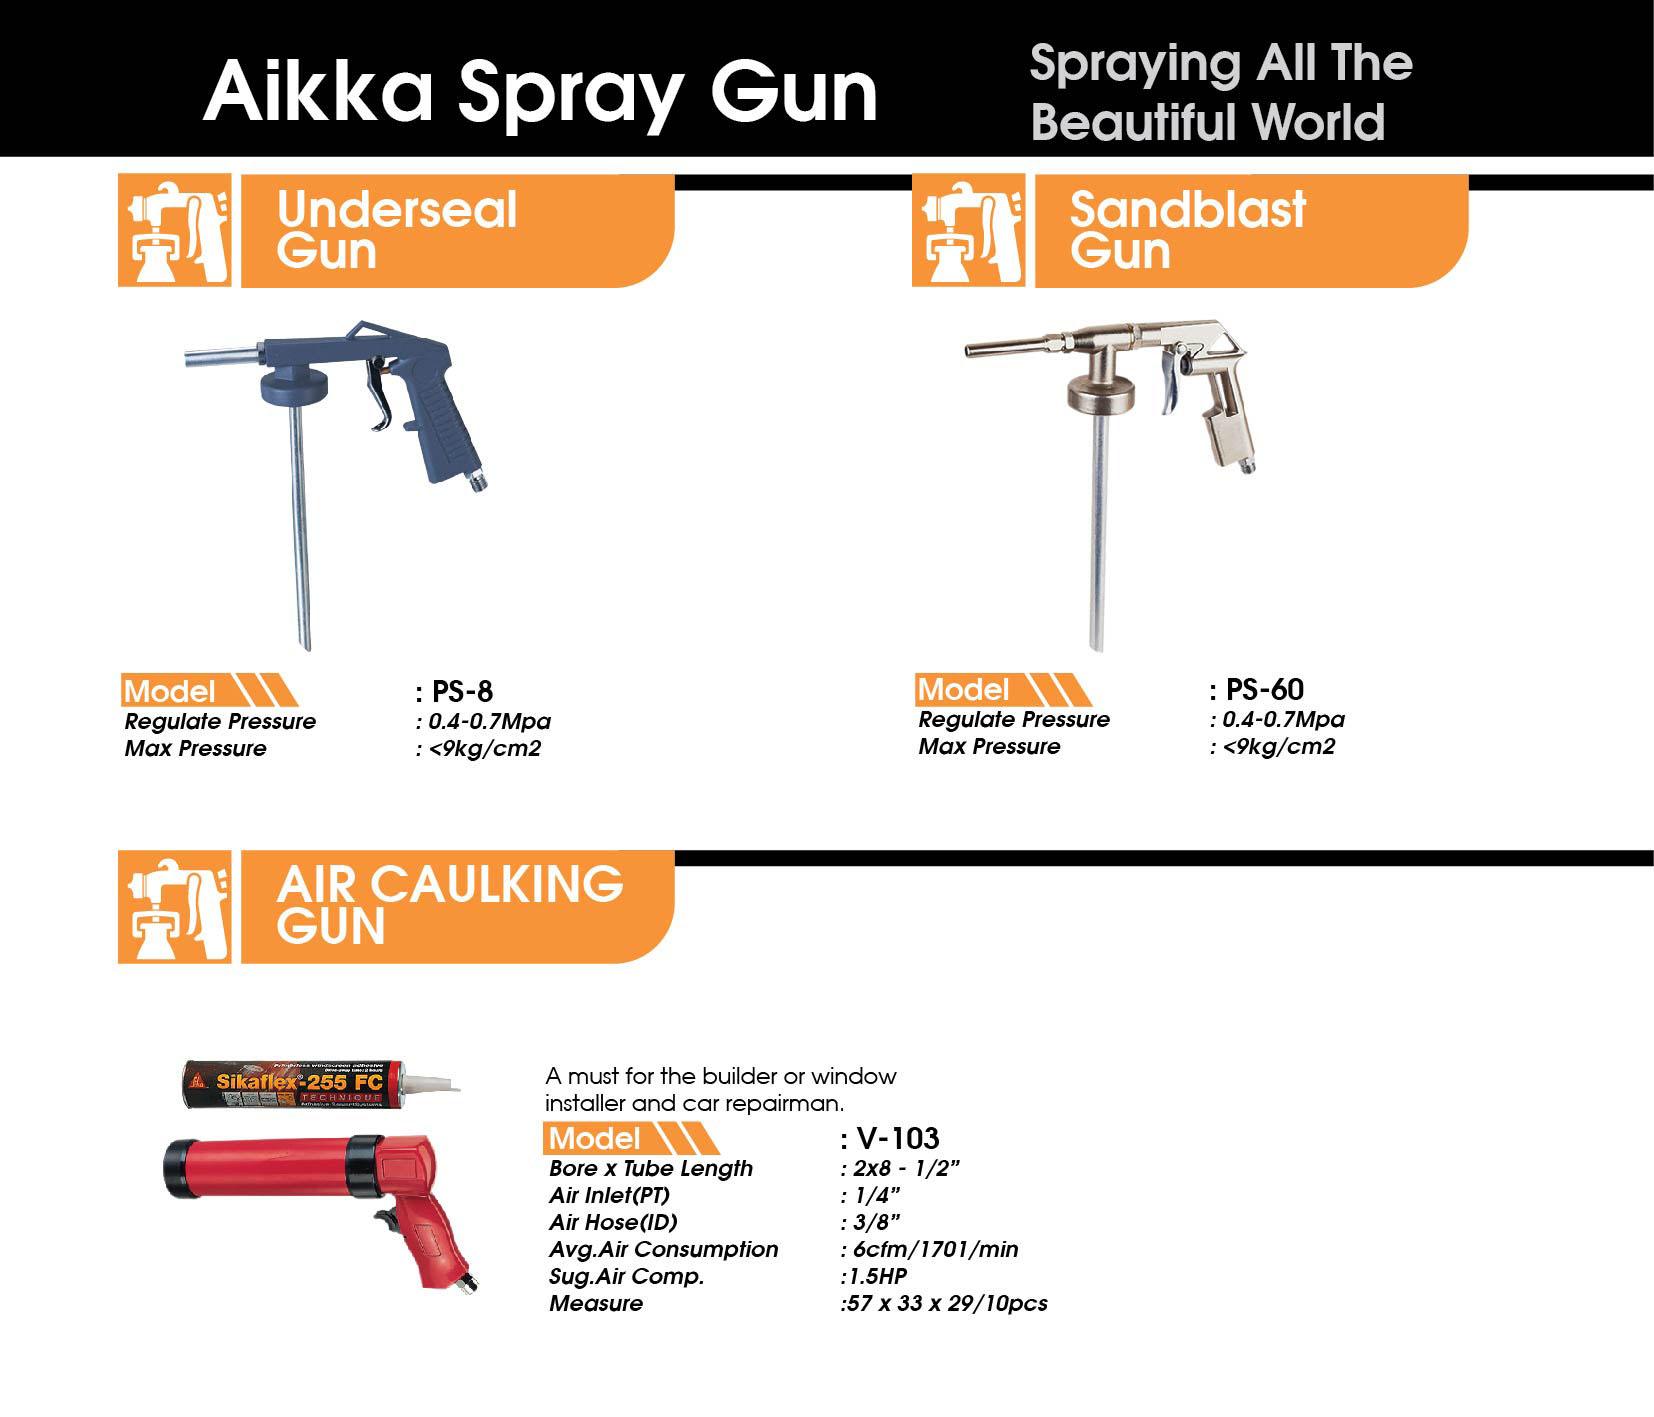 spray gun malaysia Aikka